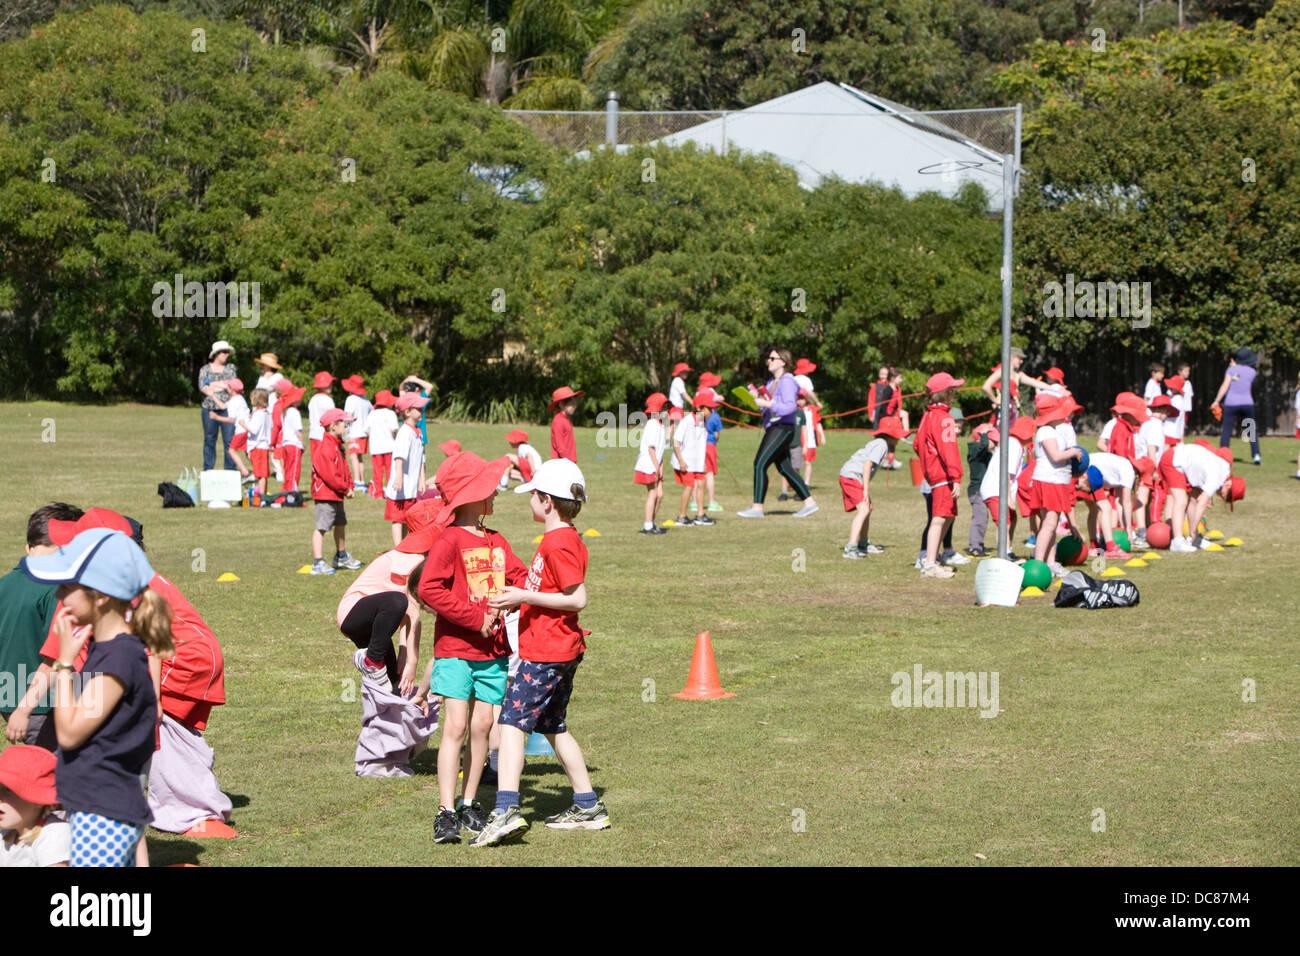 Pennsylvania primary date in Sydney